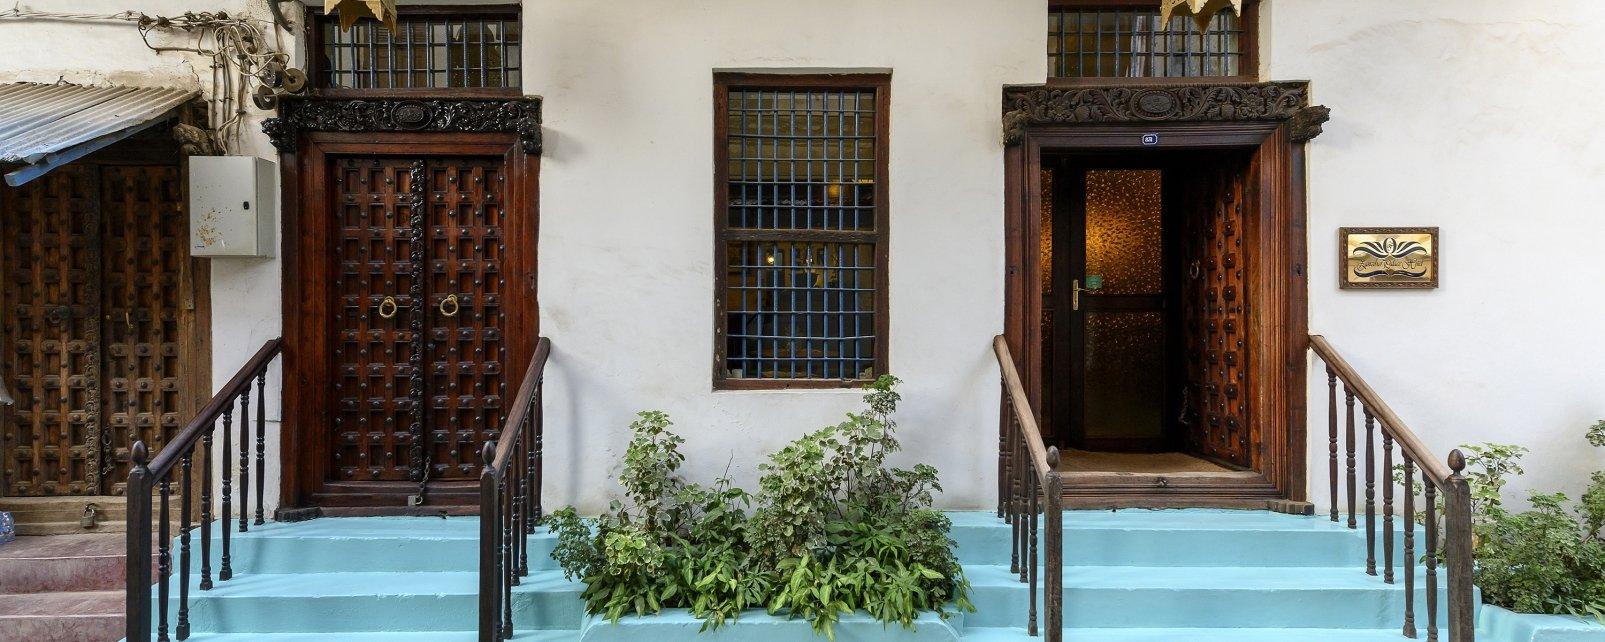 Hôtel Zanzibar Palace